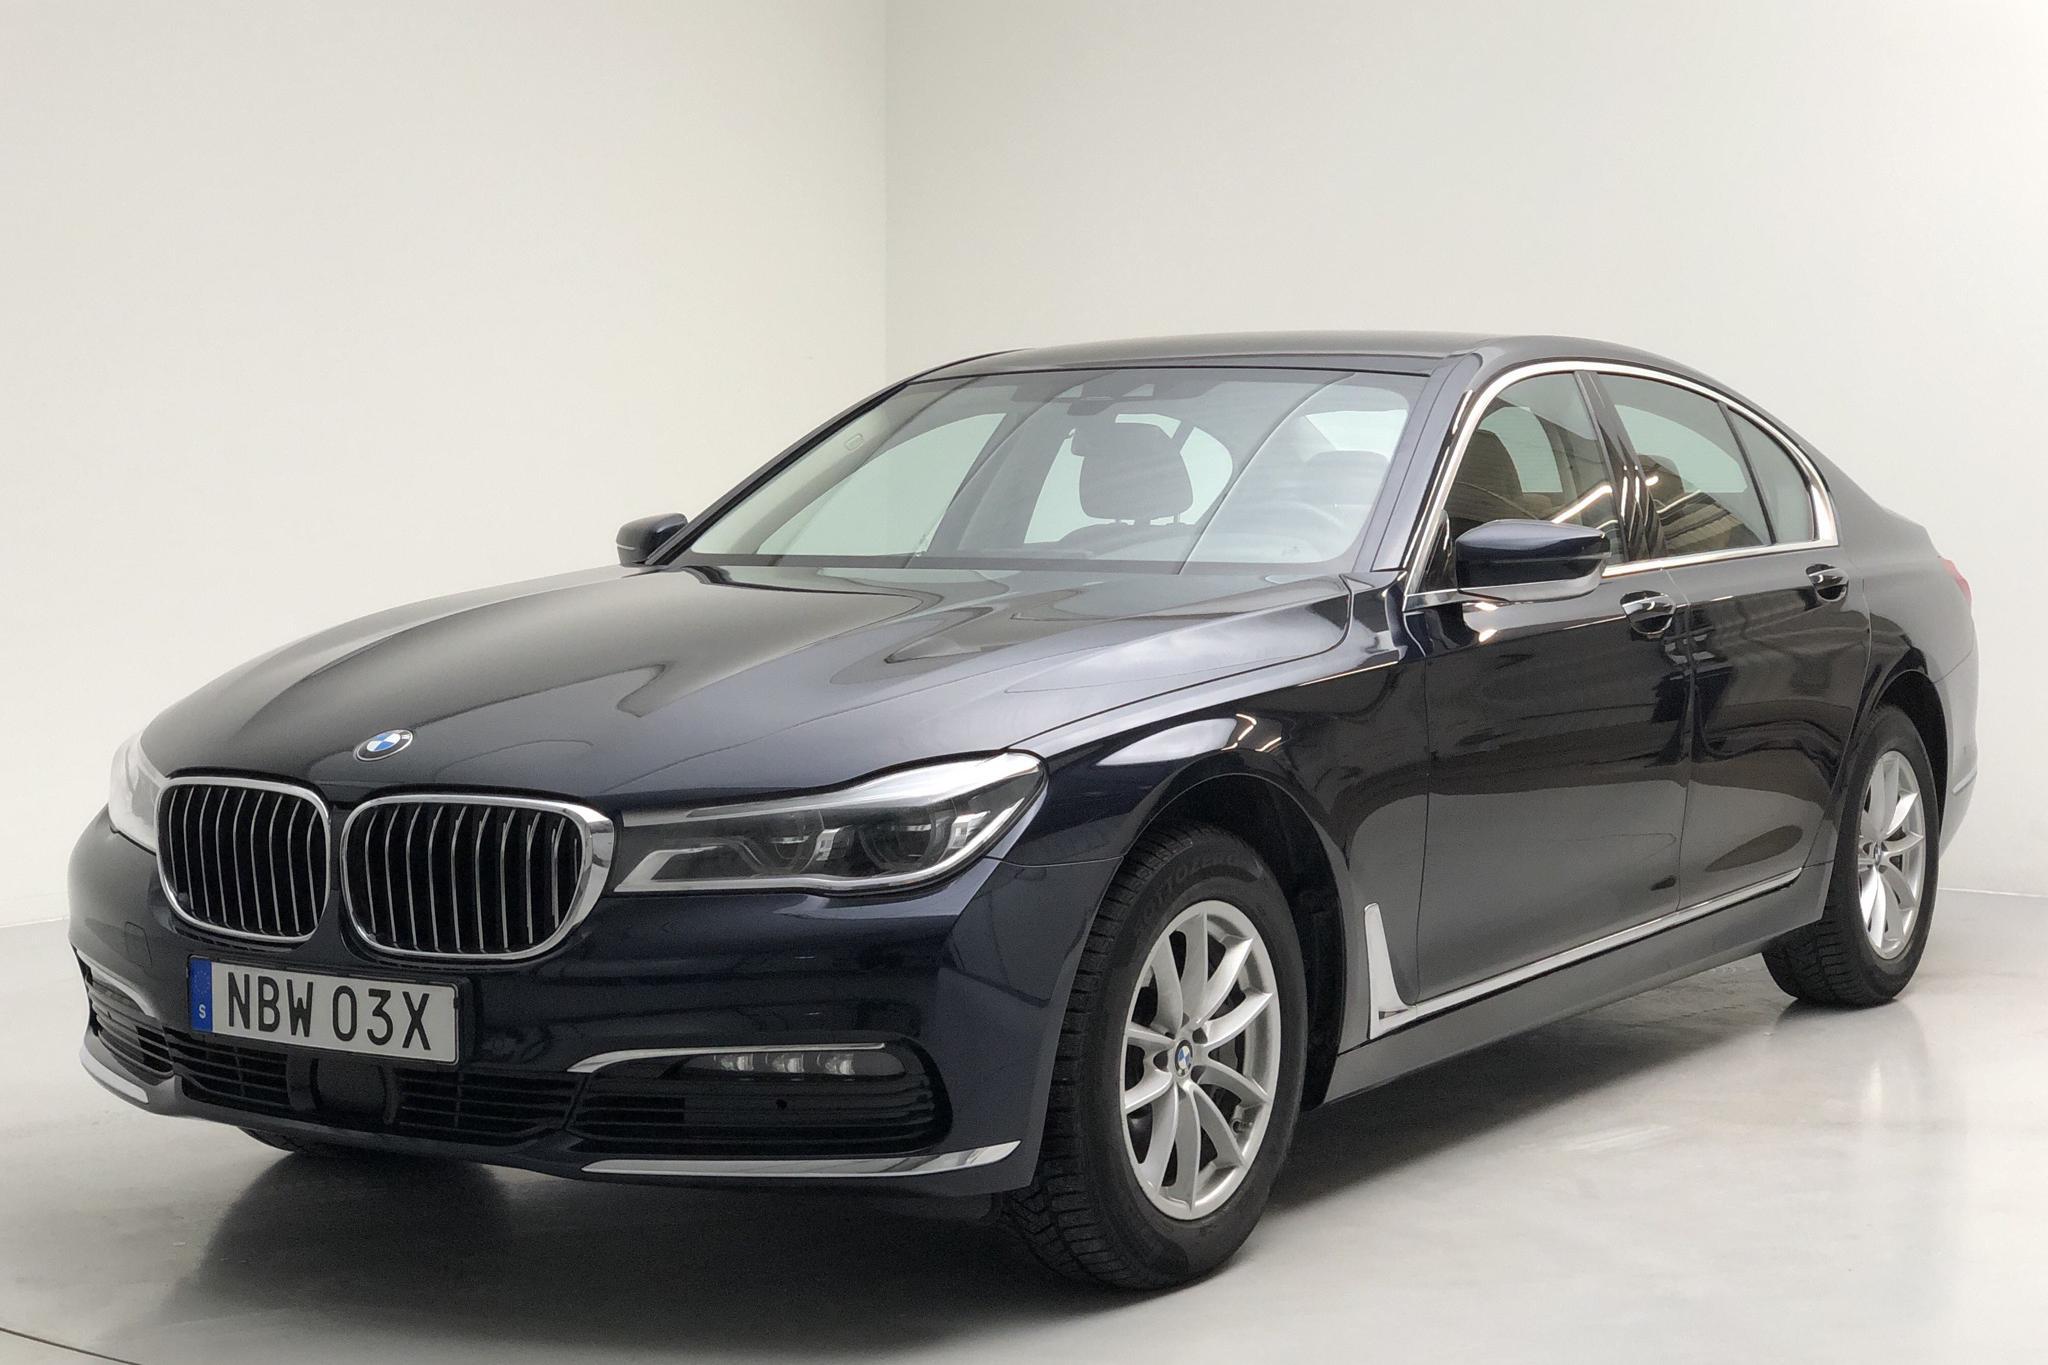 BMW 730d xDrive Sedan, G11 (265hk) - 74 530 km - Automatic - Dark Blue - 2018